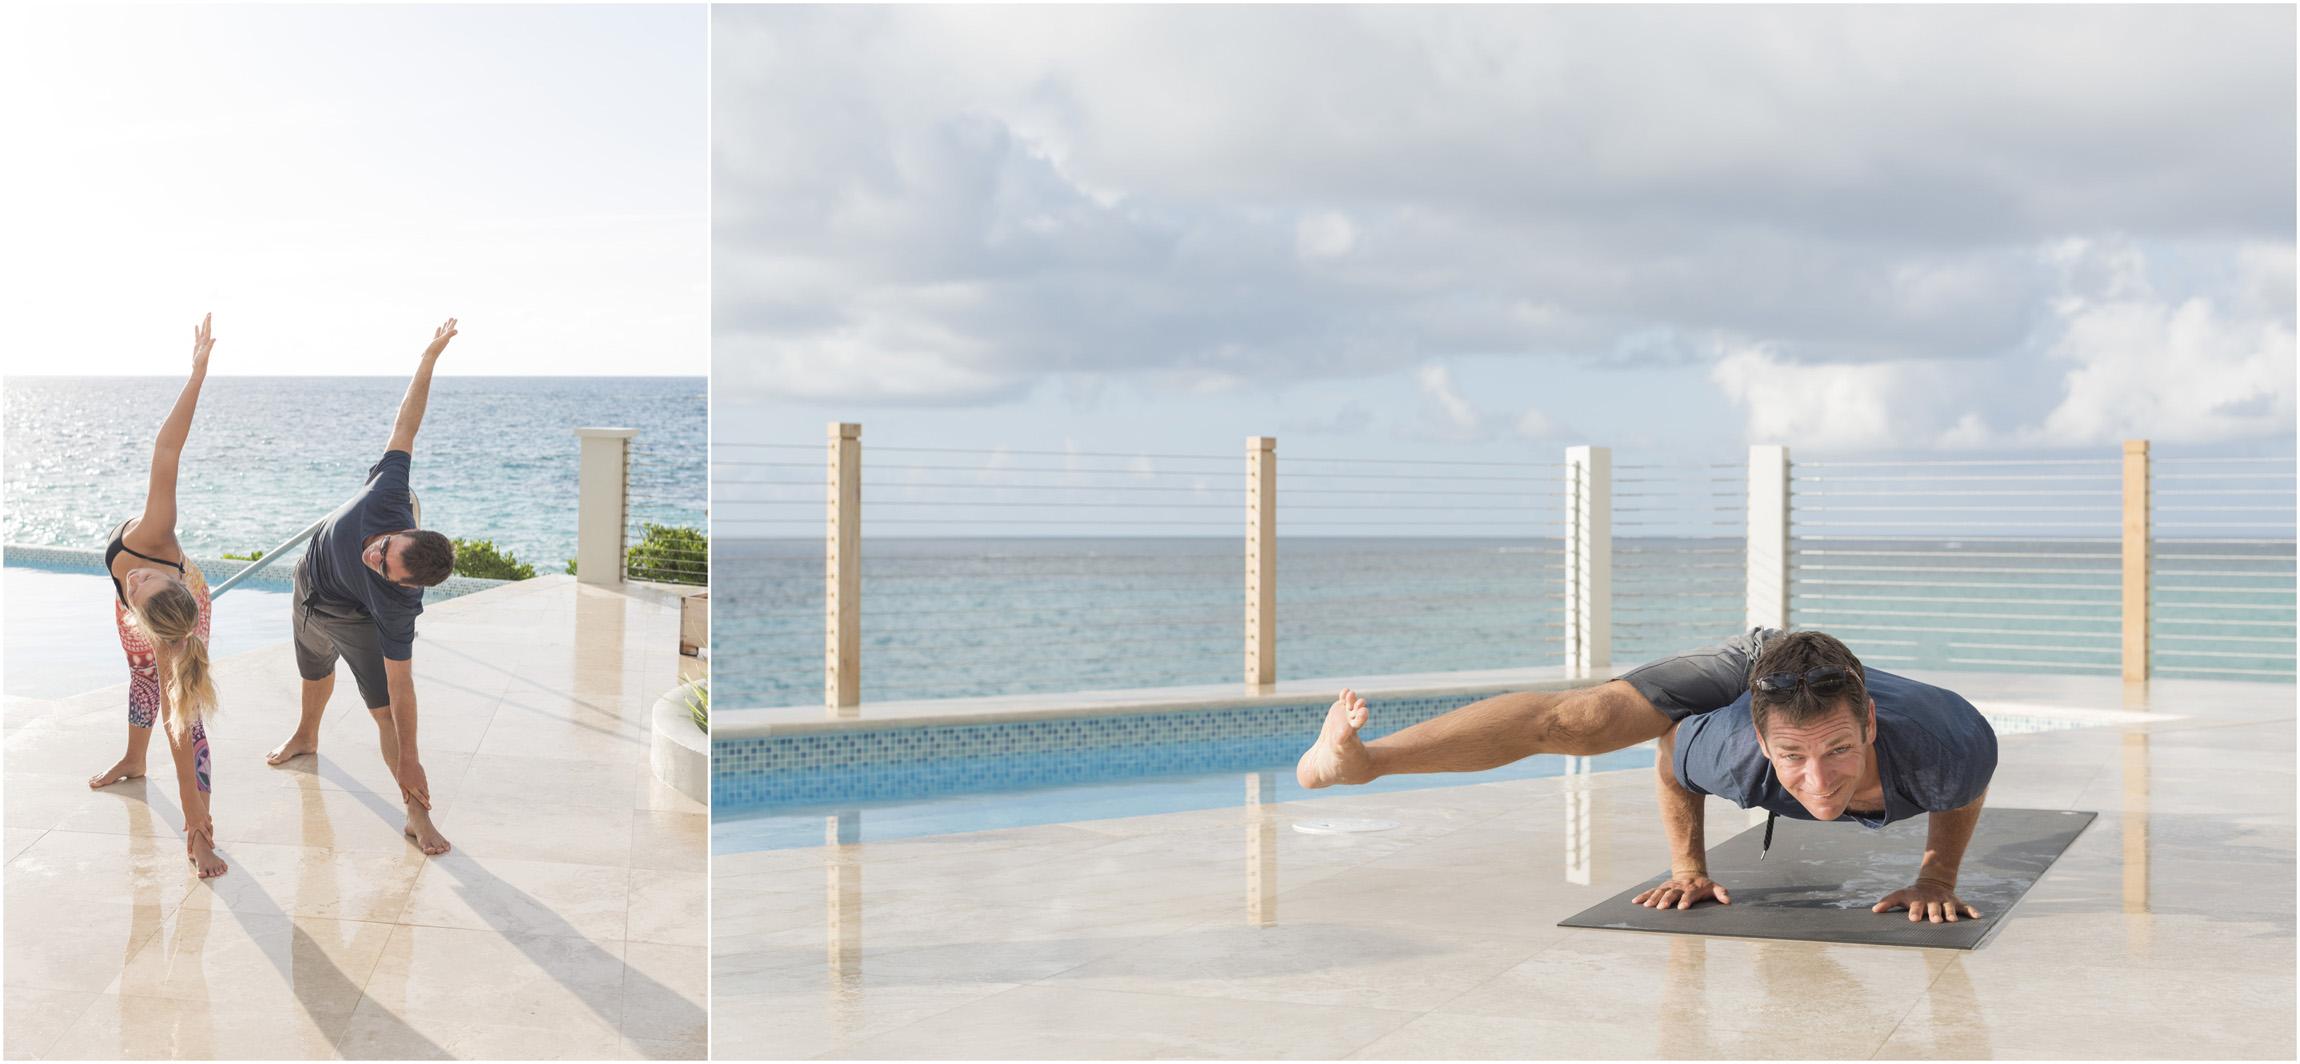 ©FianderFoto_Winnow_Poolside Yoga_004.jpg